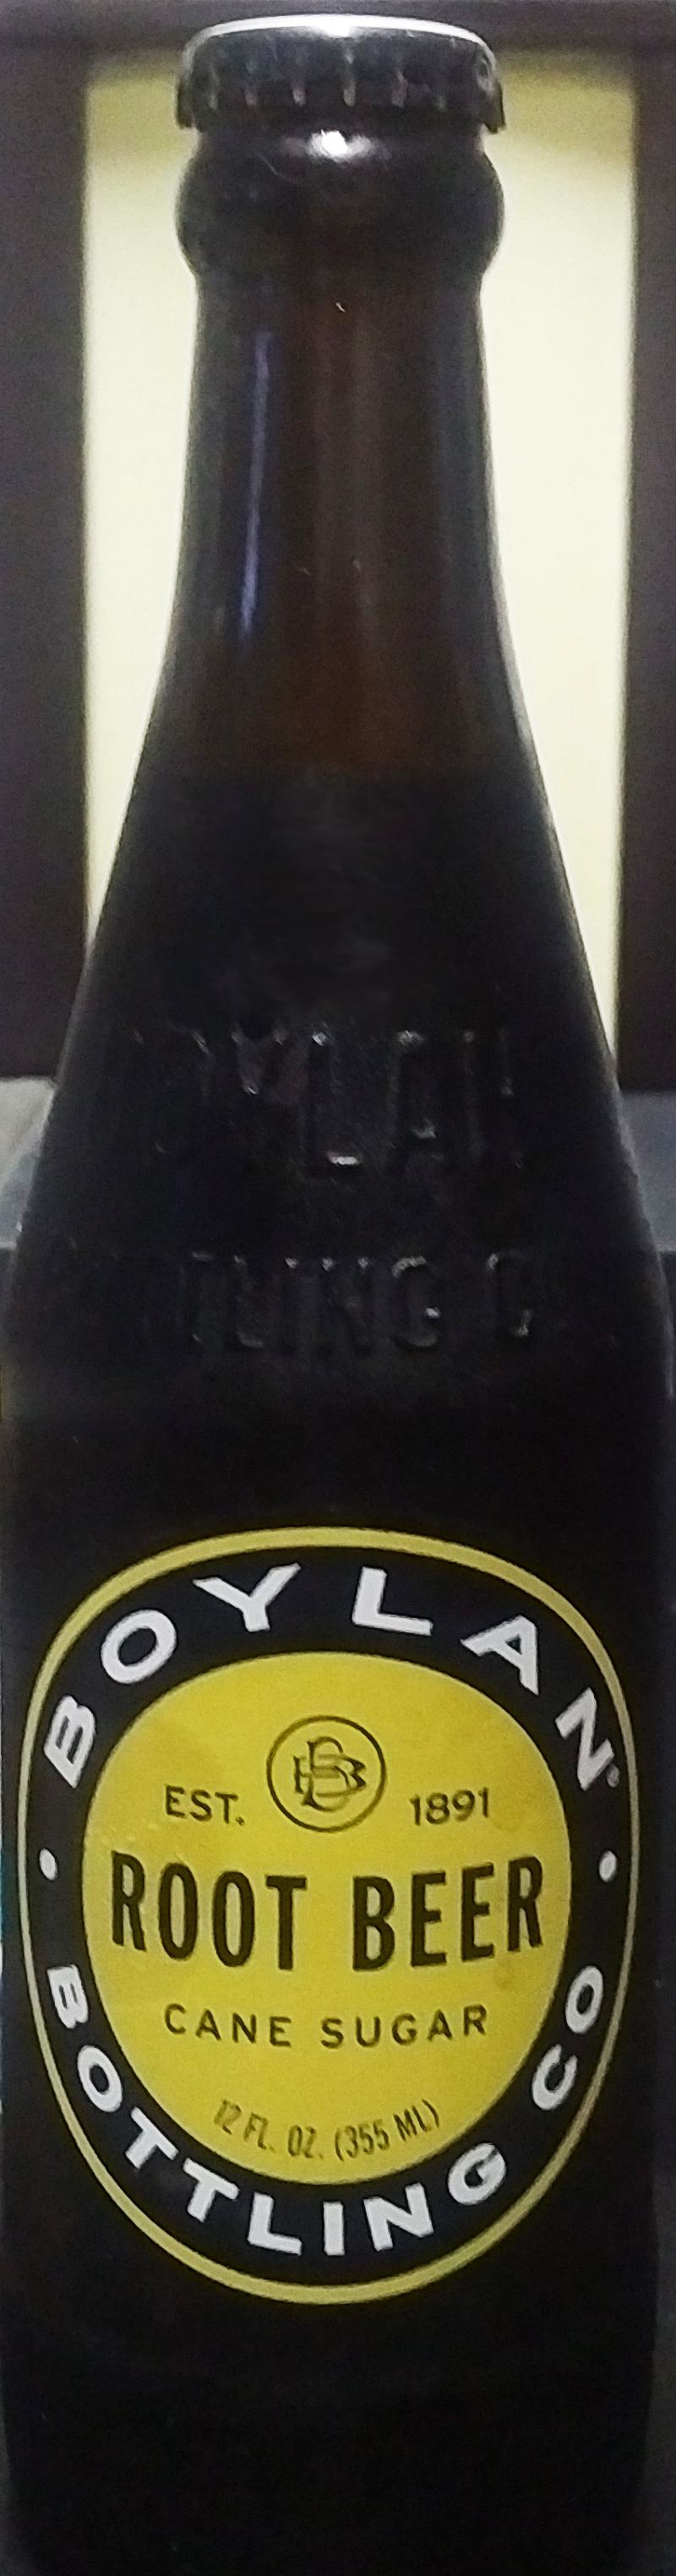 Boylan Cane Sugar Root Beer